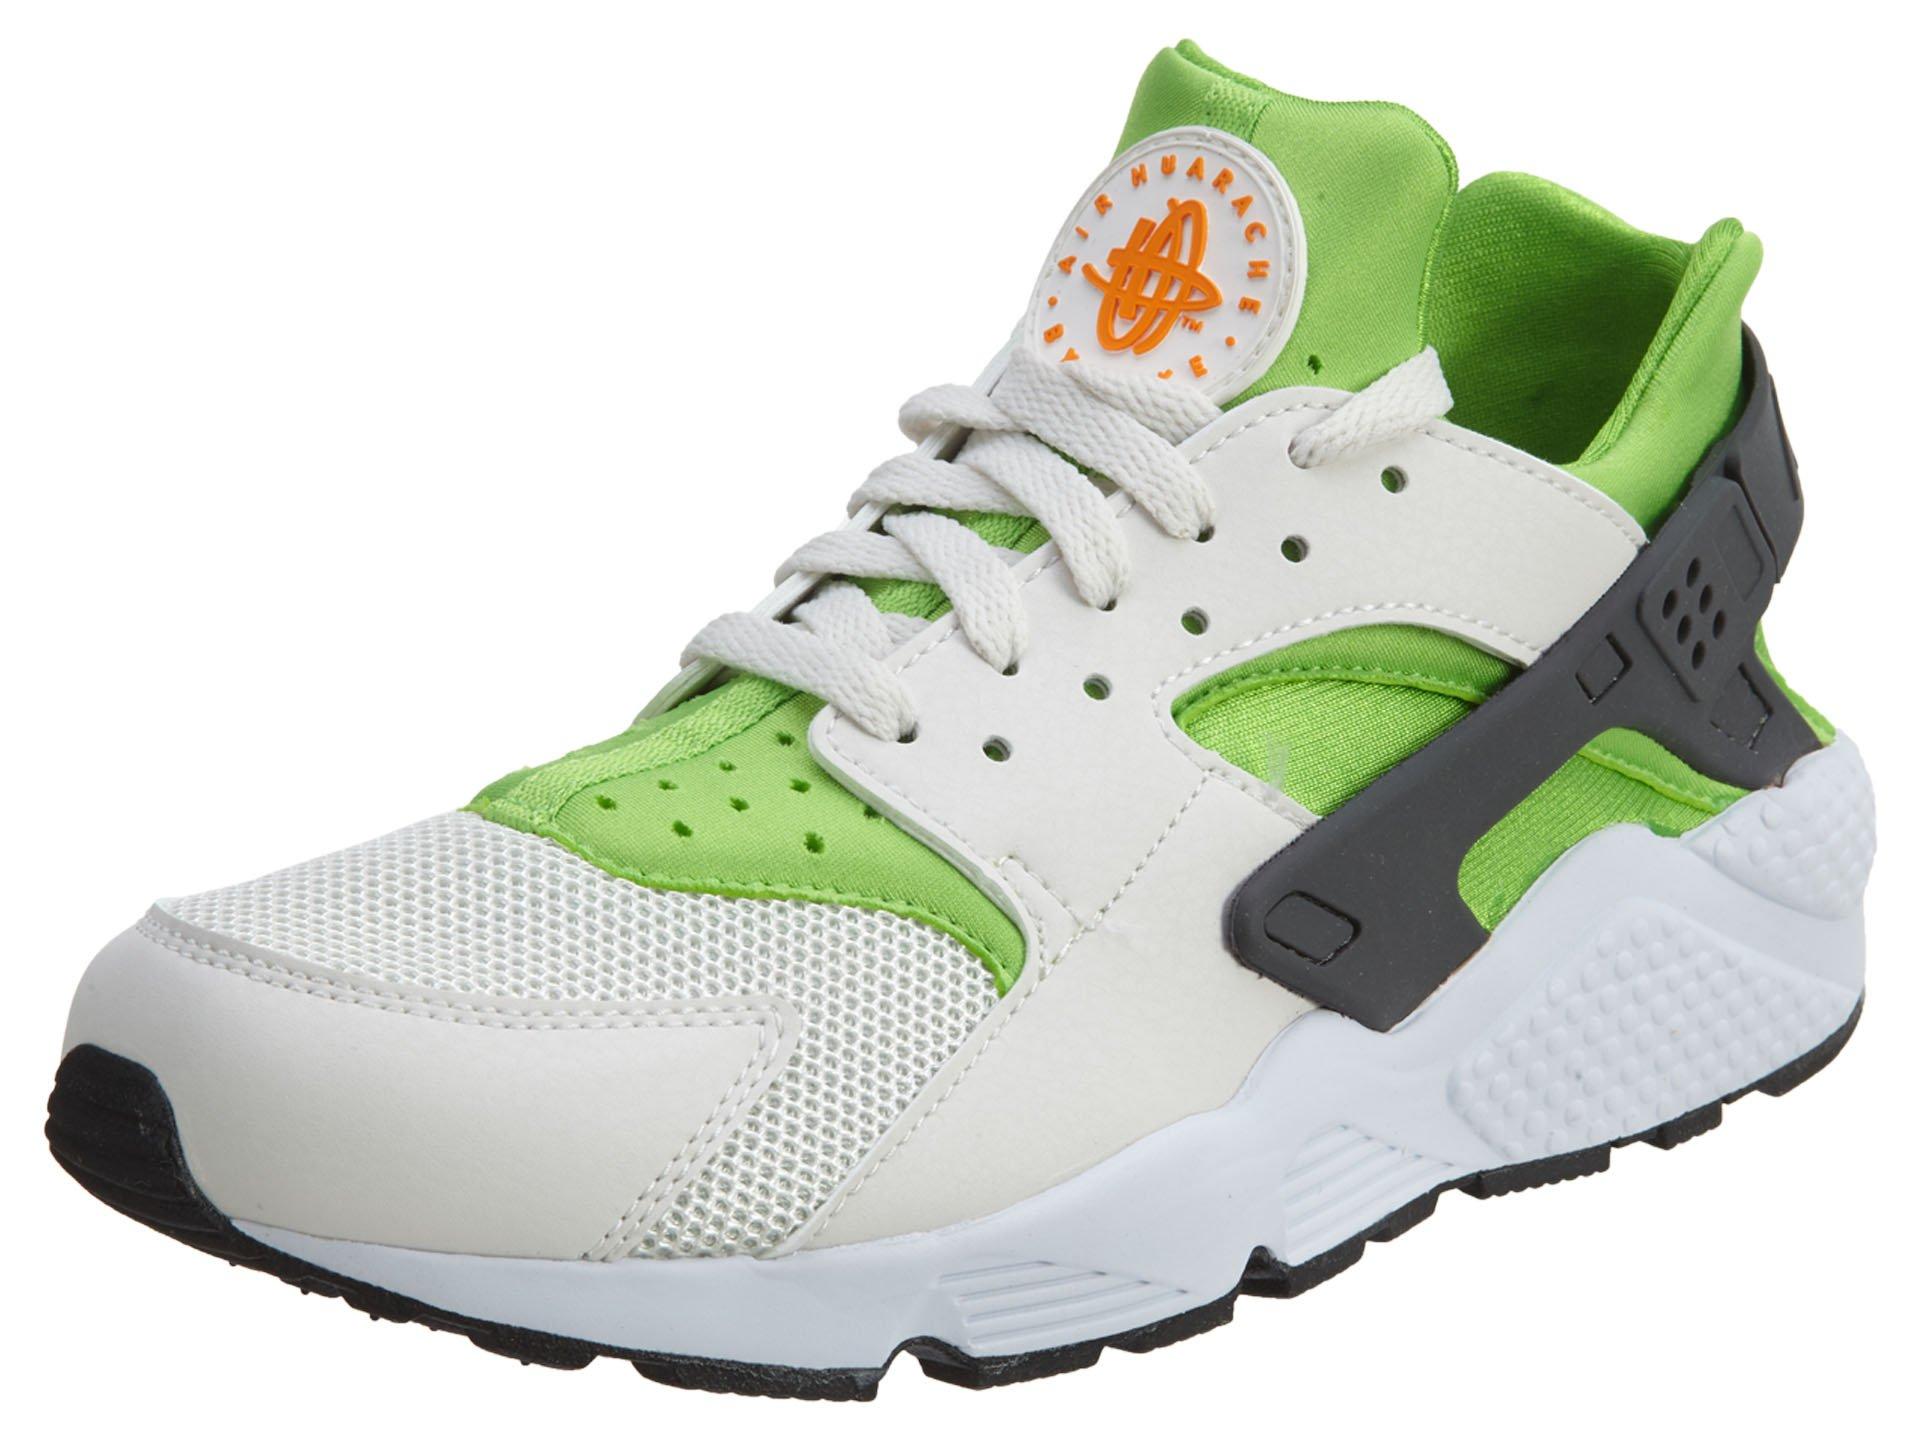 Nike Men's Air Huarache Actn Green/Vvd Orng Phntm Wht Running Shoe 10.5 Men US by NIKE (Image #1)